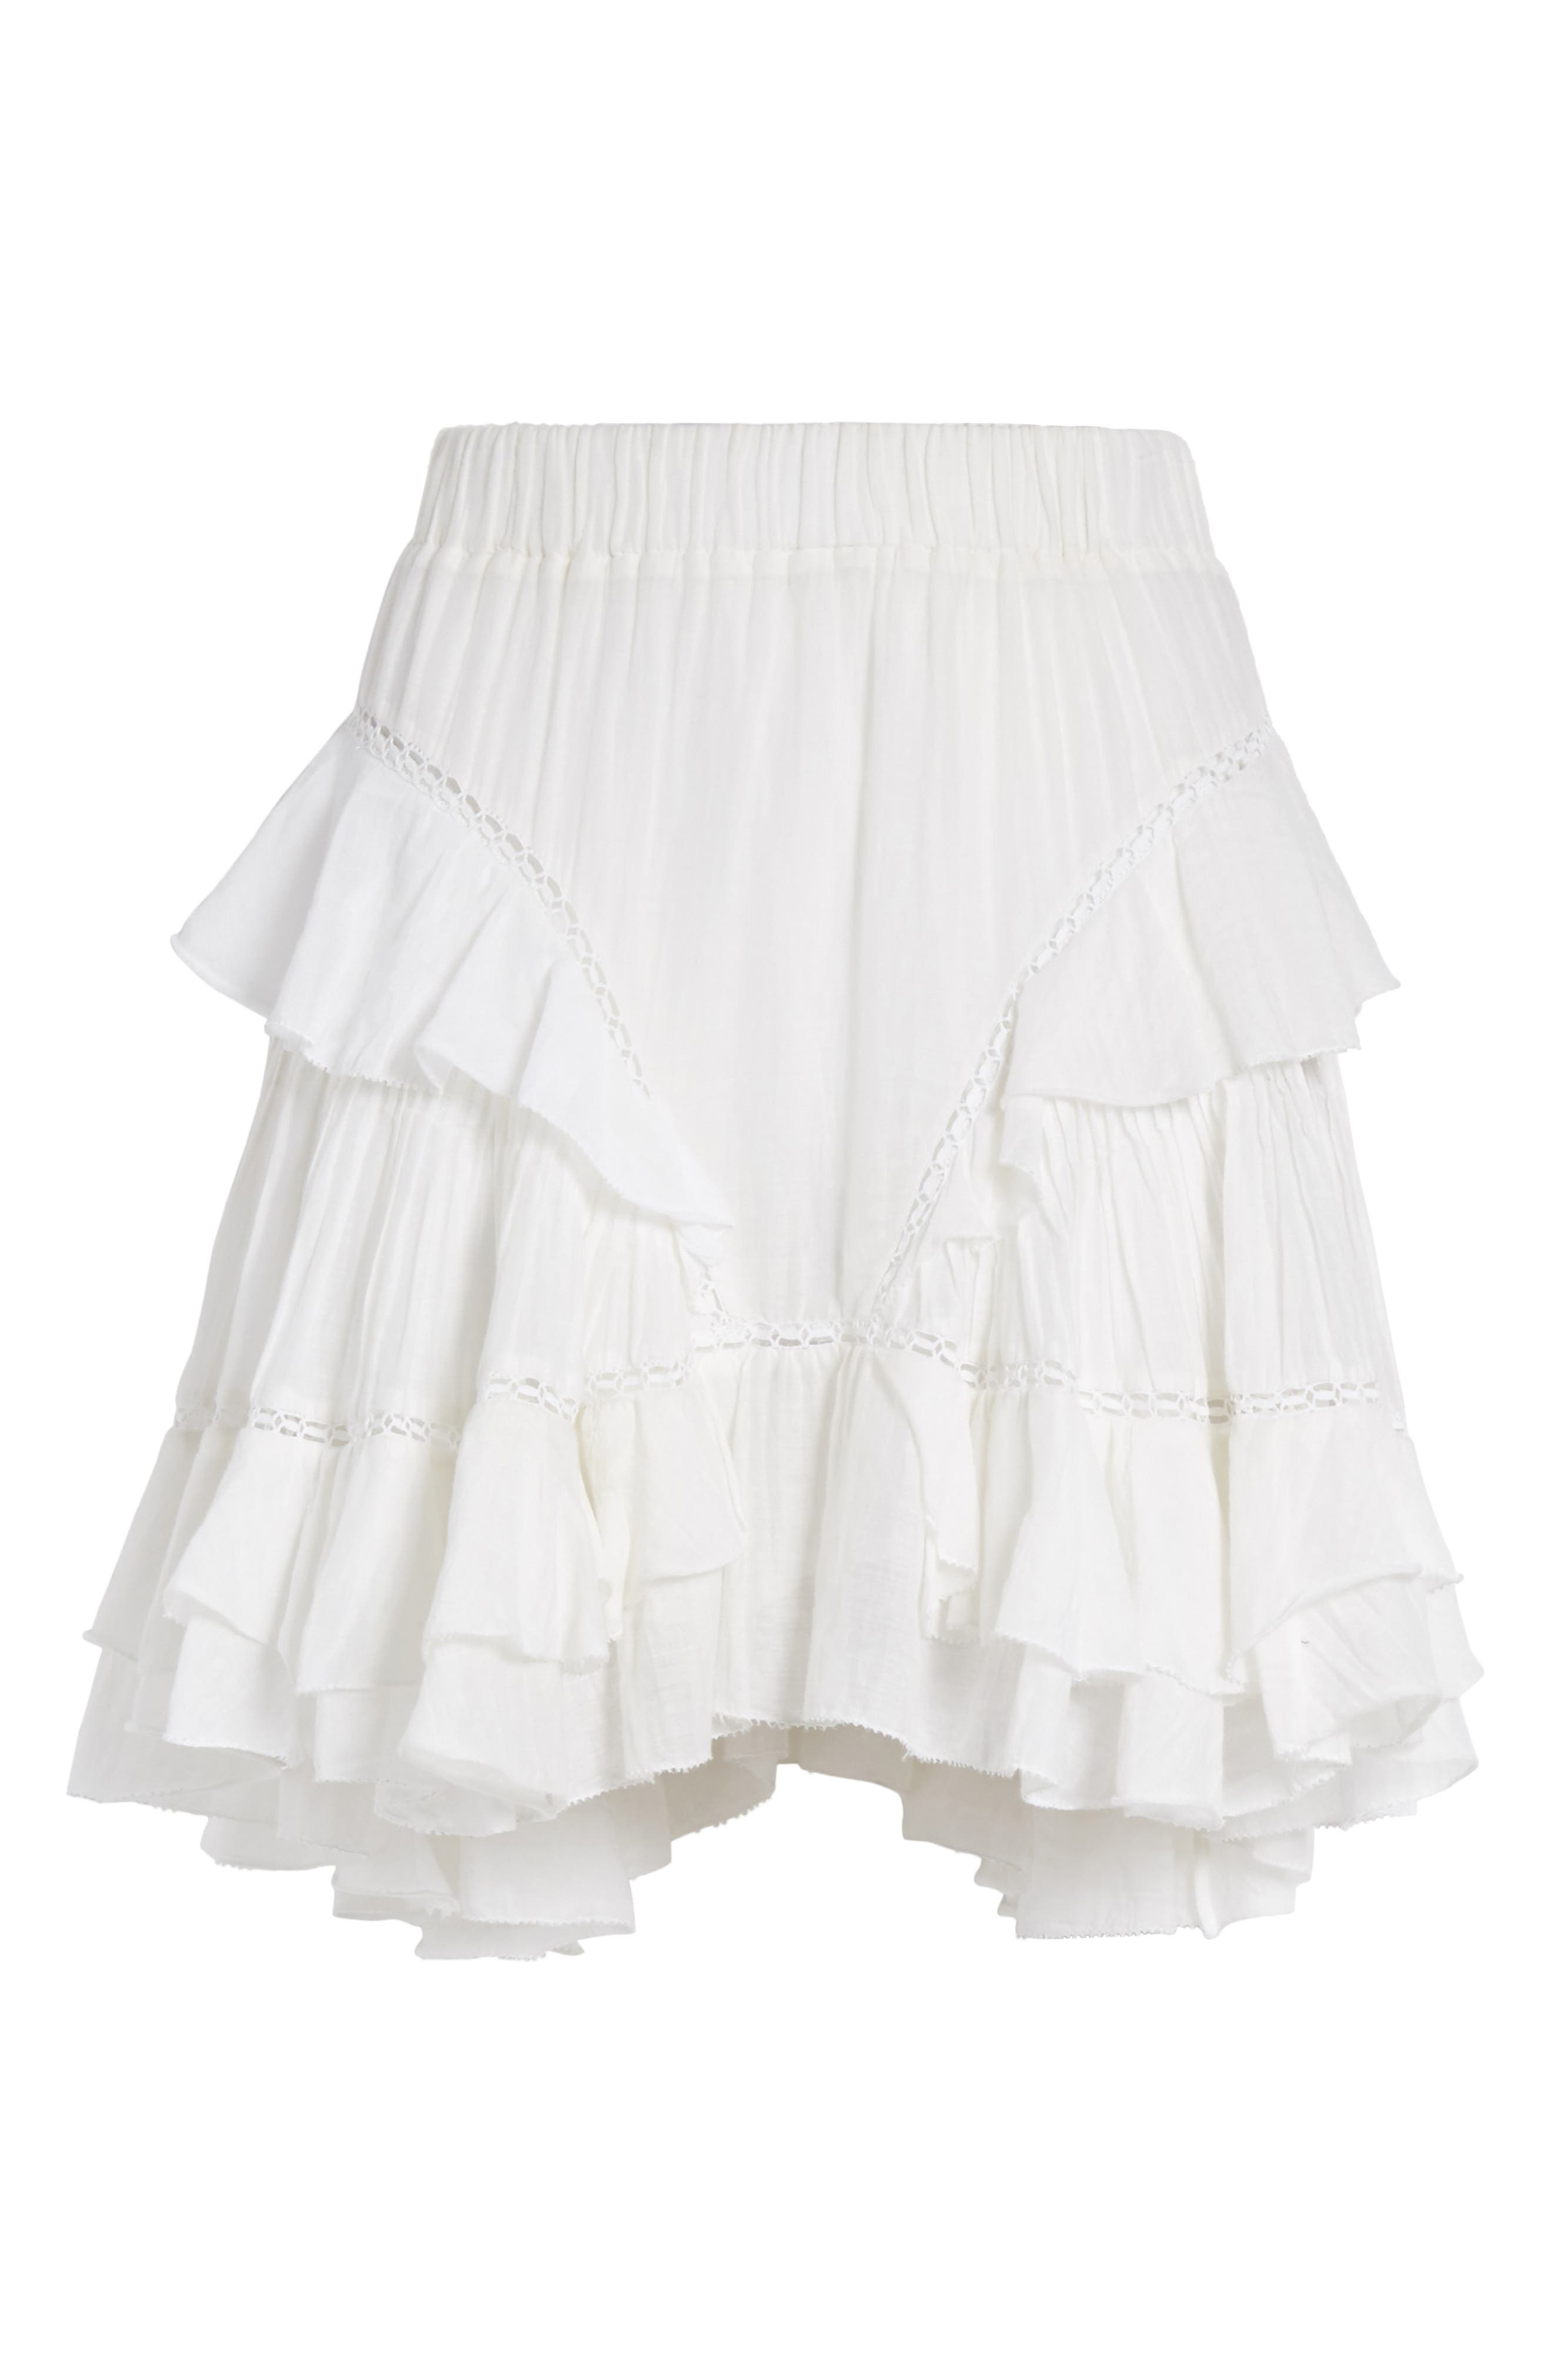 Isabel Marant Étoile Varese Ruffle Skirt,                             Alternate thumbnail 6, color,                             100